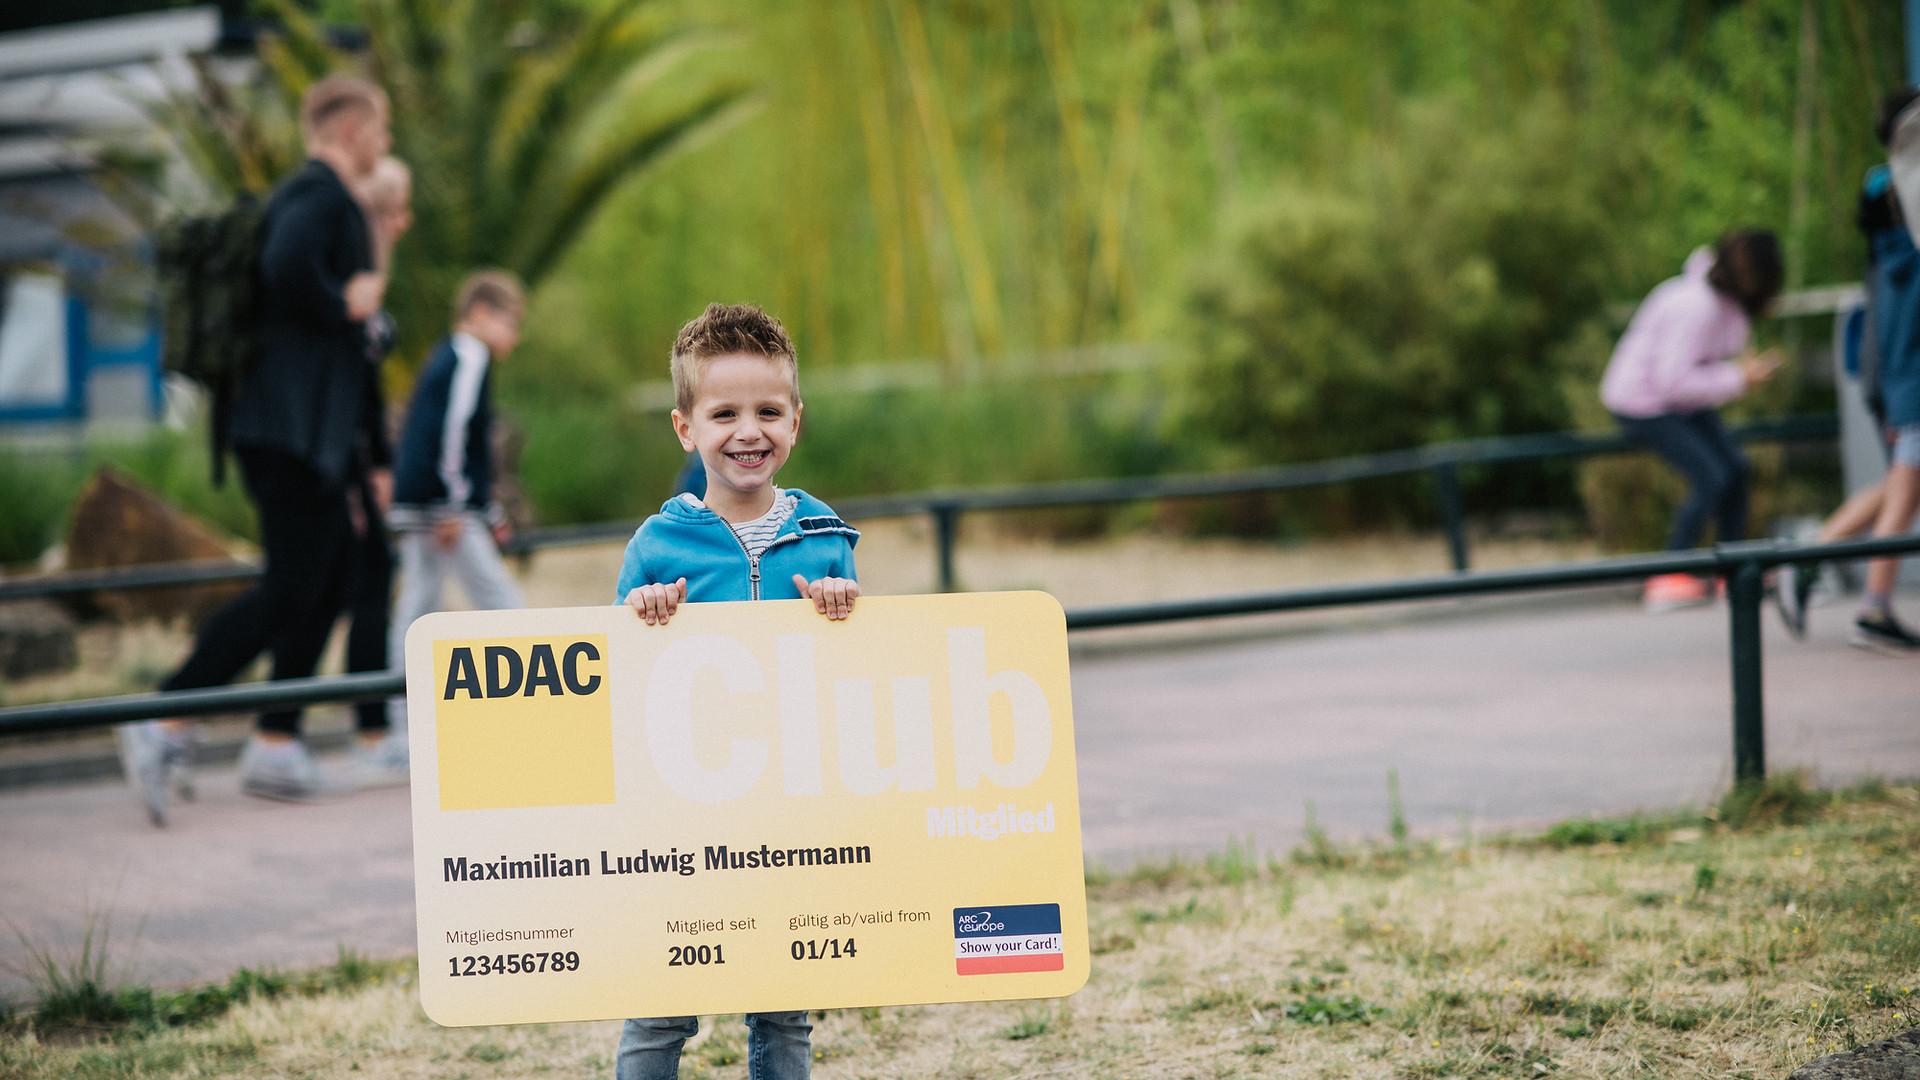 ADAC Kampagne